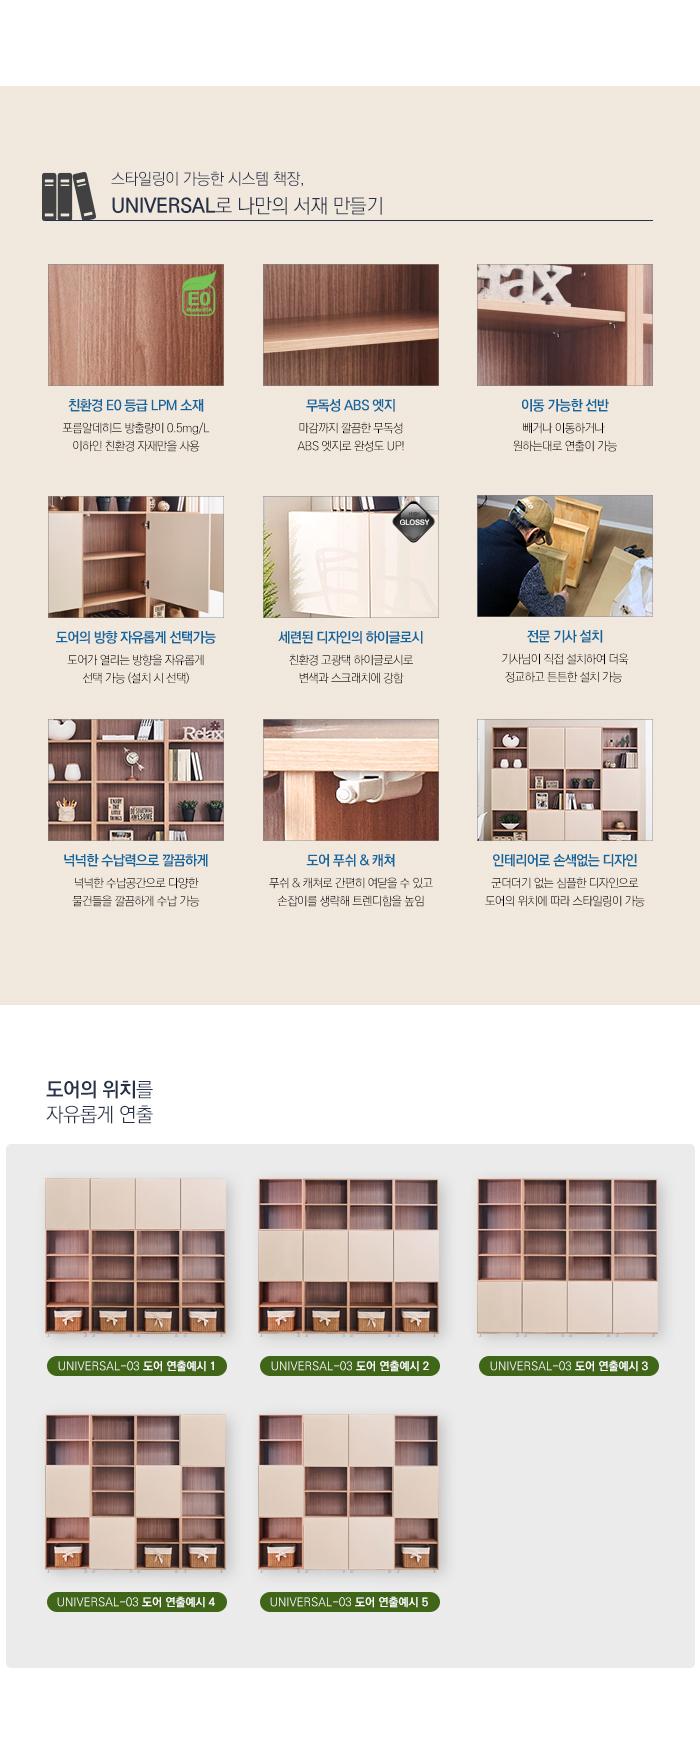 Universal-wall-unit-series.jpg